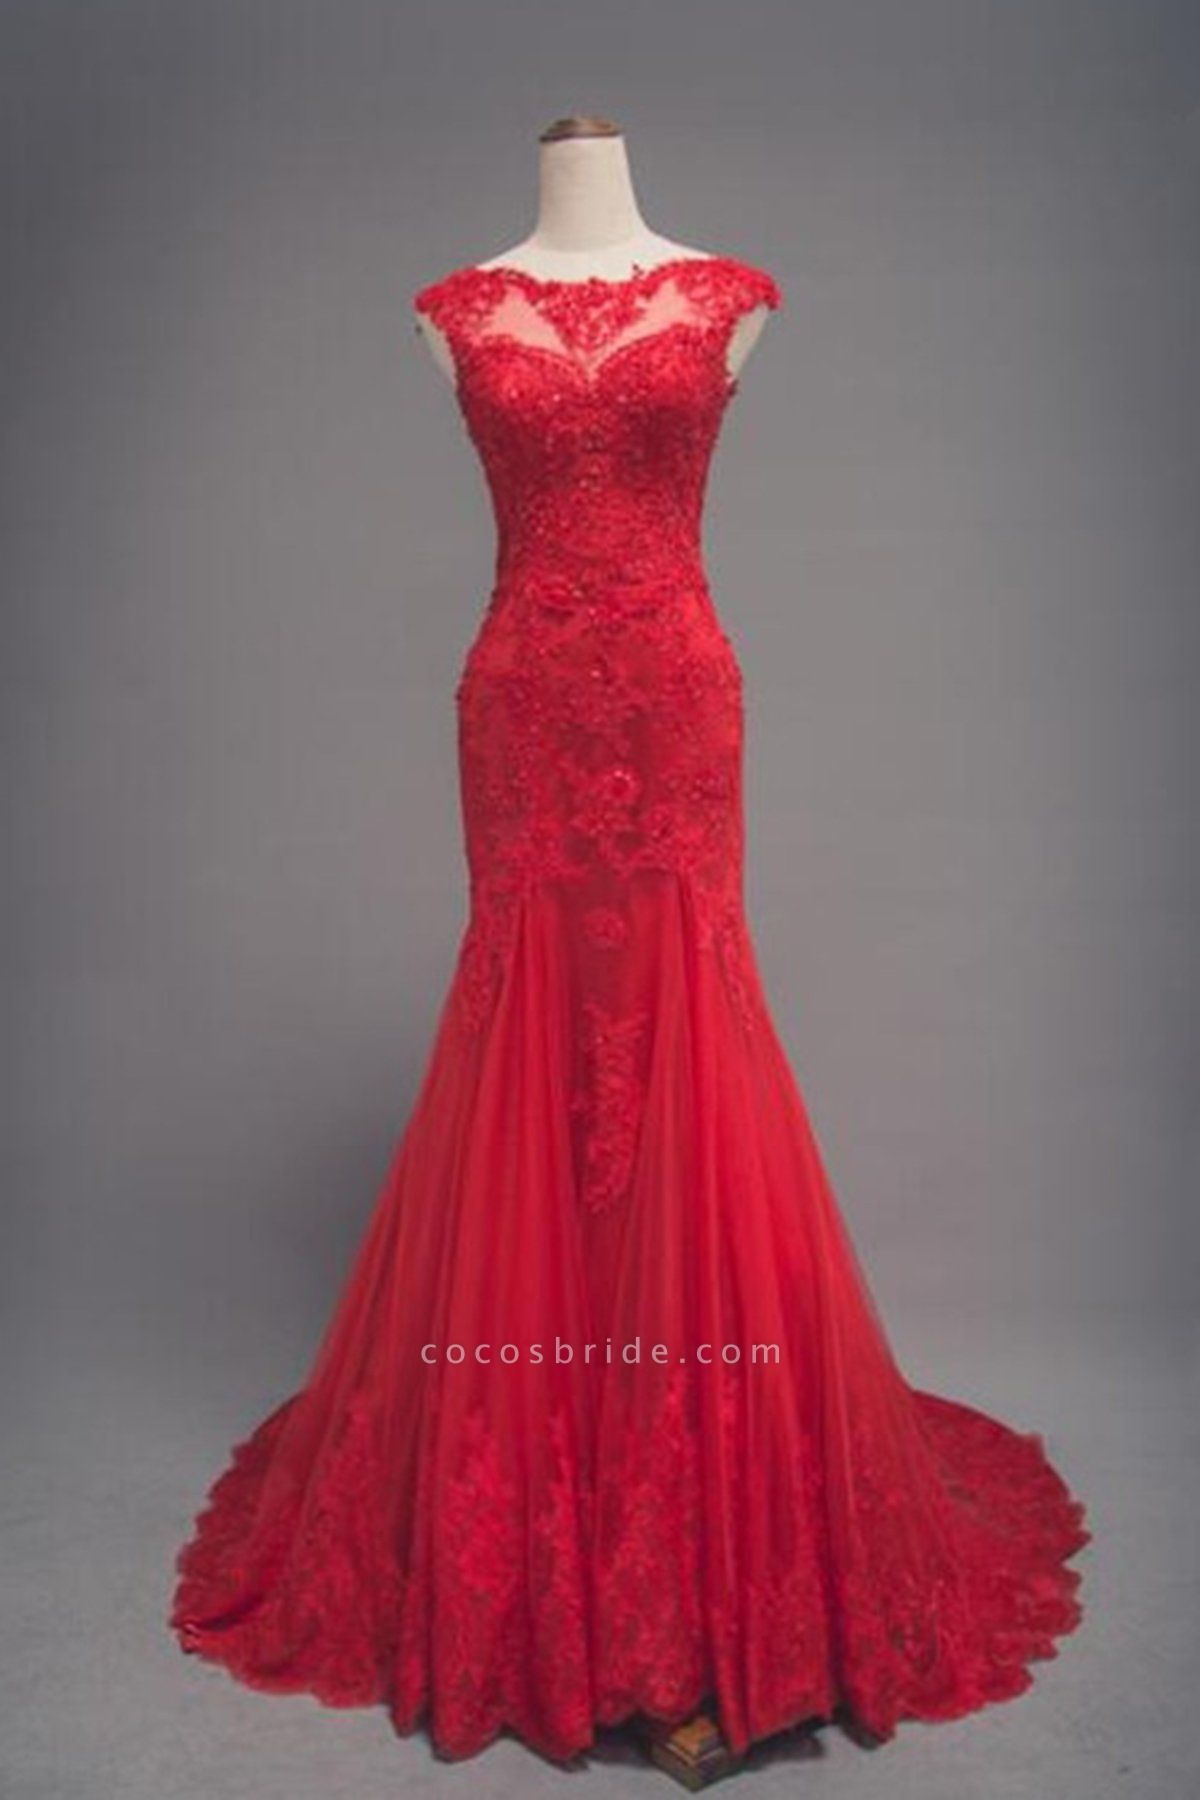 Red Lace Long Train Mermaid Cap Sleeve Prom Dress